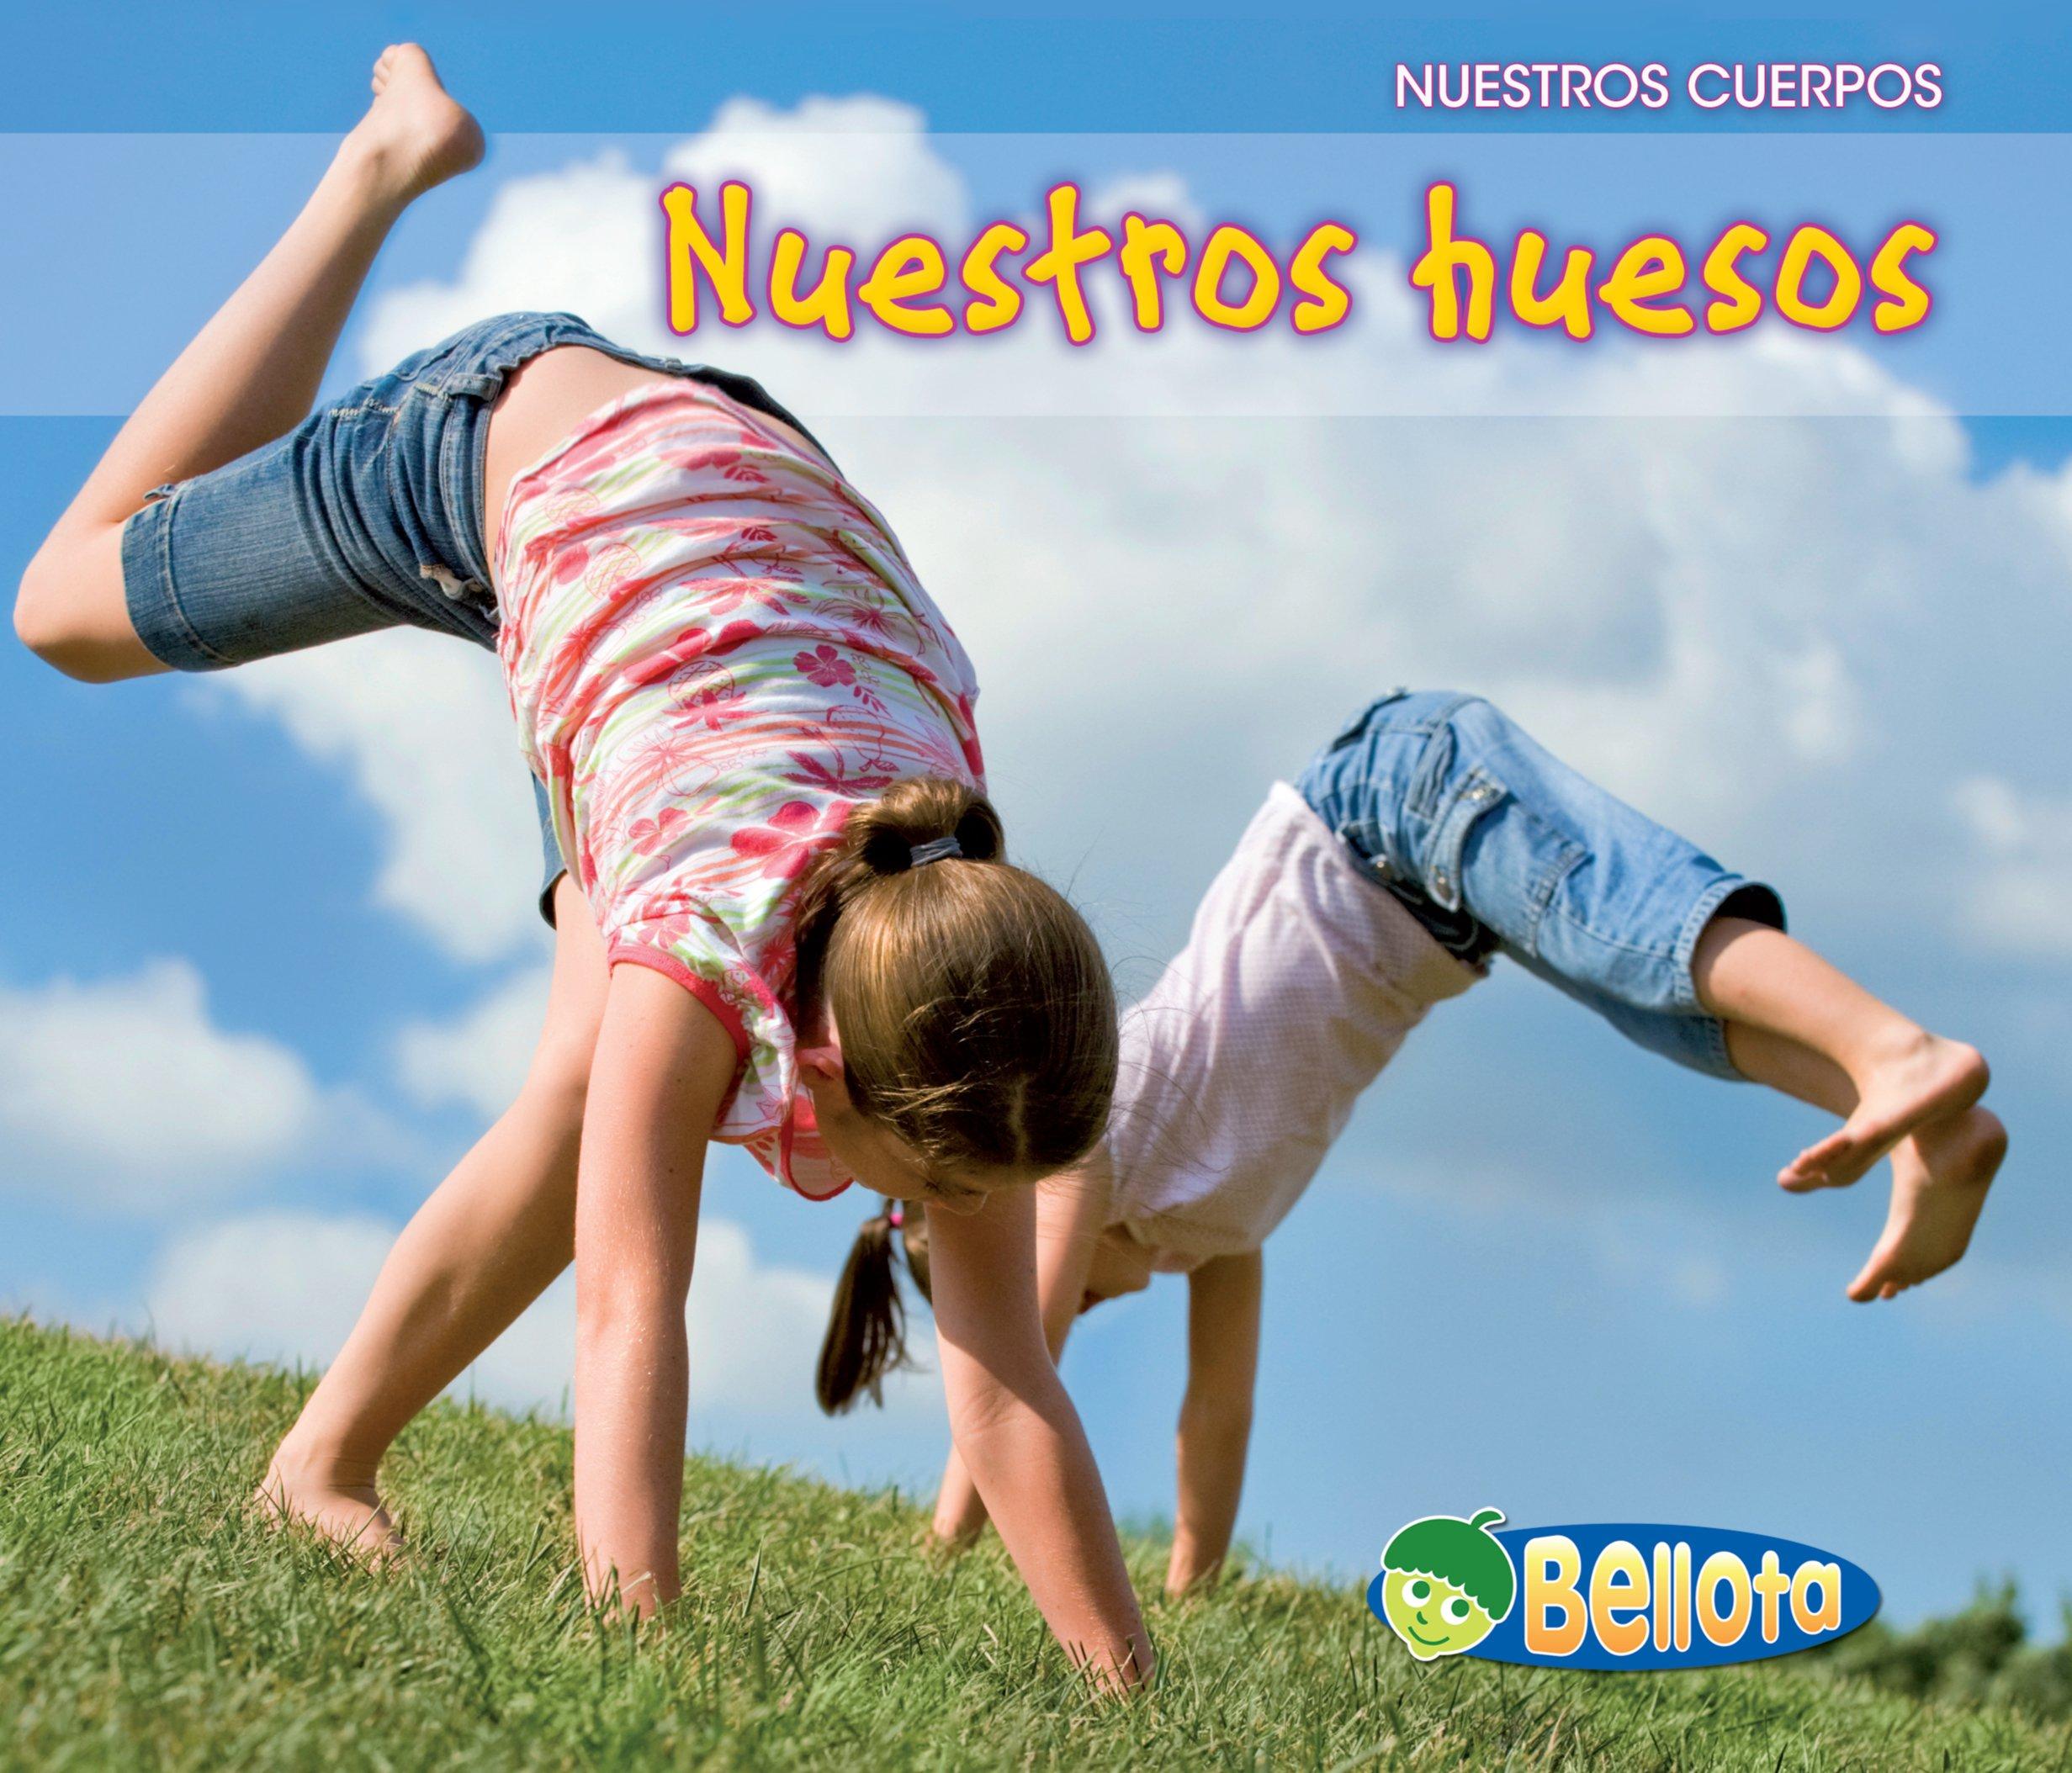 Nuestros huesos (Nuestros cuerpos) (Spanish Edition) by Brand: Heinemann